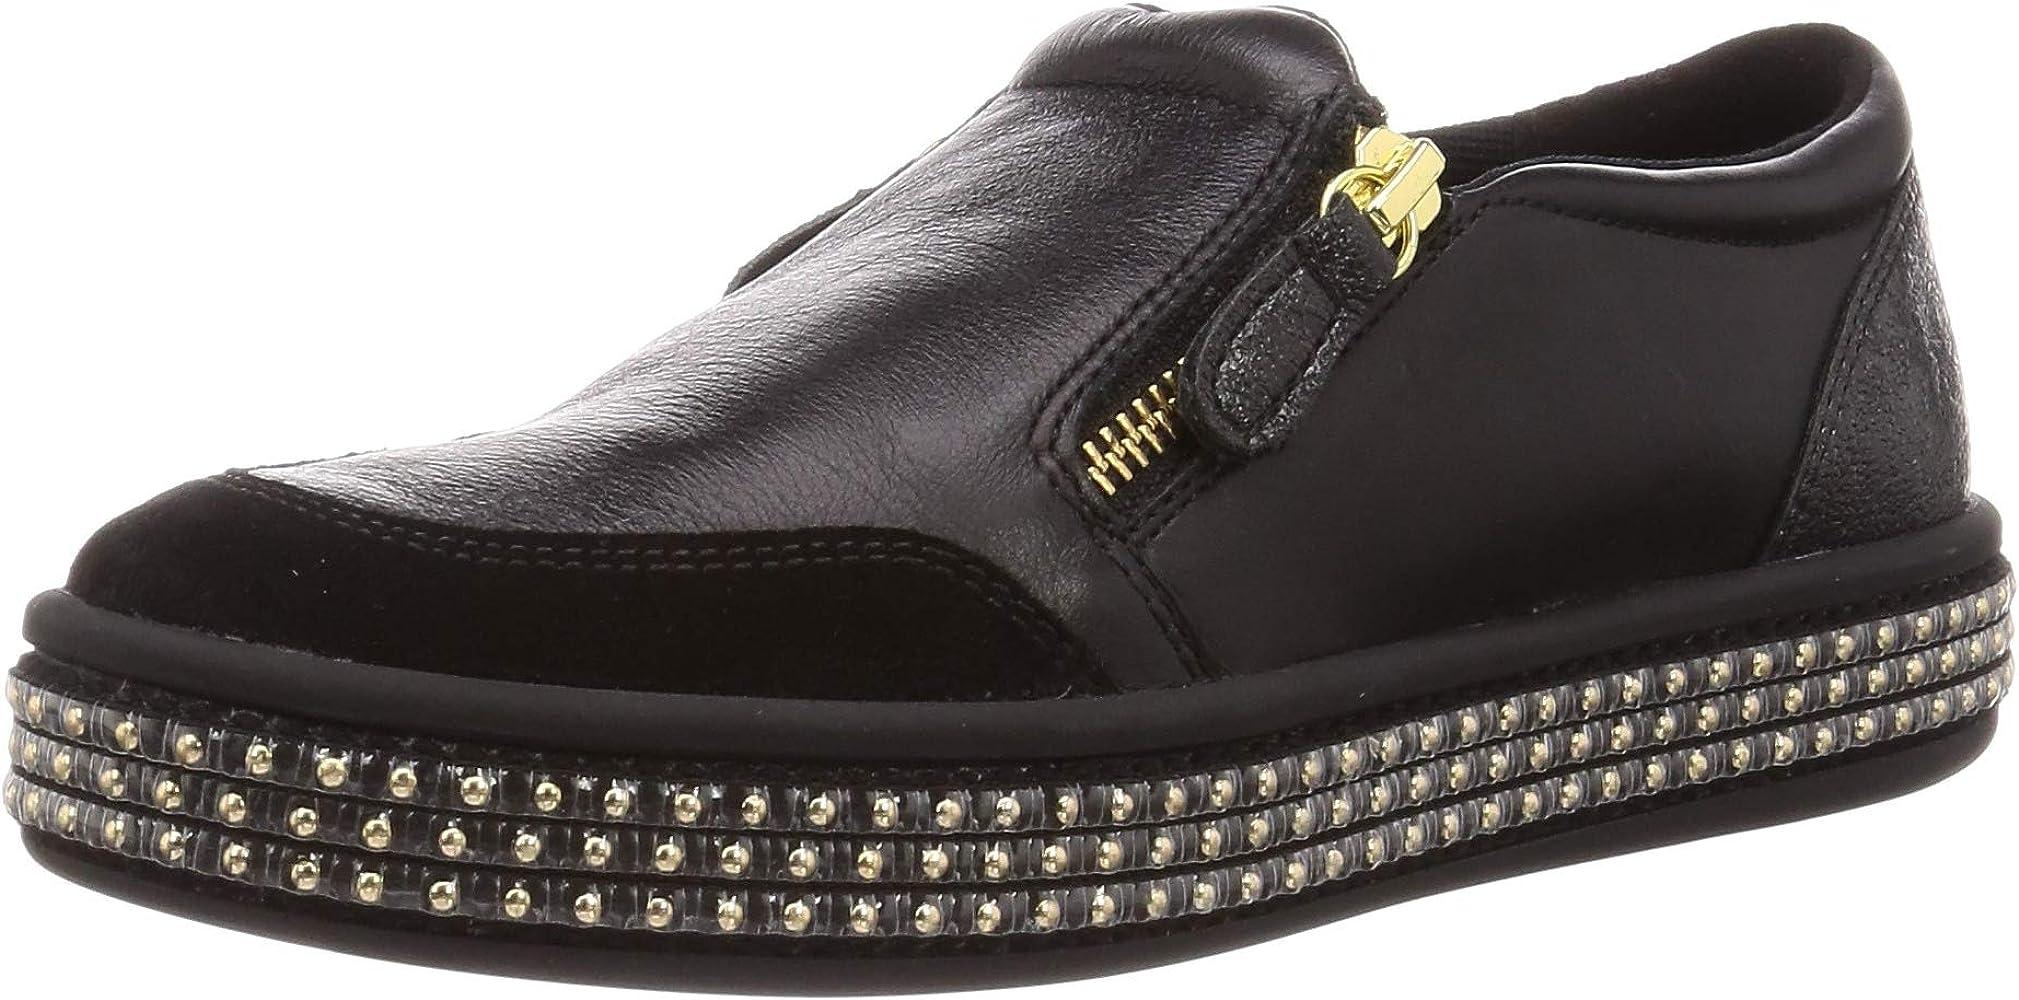 lapso calentar frente  Amazon.com | Geox Women's Leather Leelu Slip-On Trainers Black 6.5 |  Fashion Sneakers